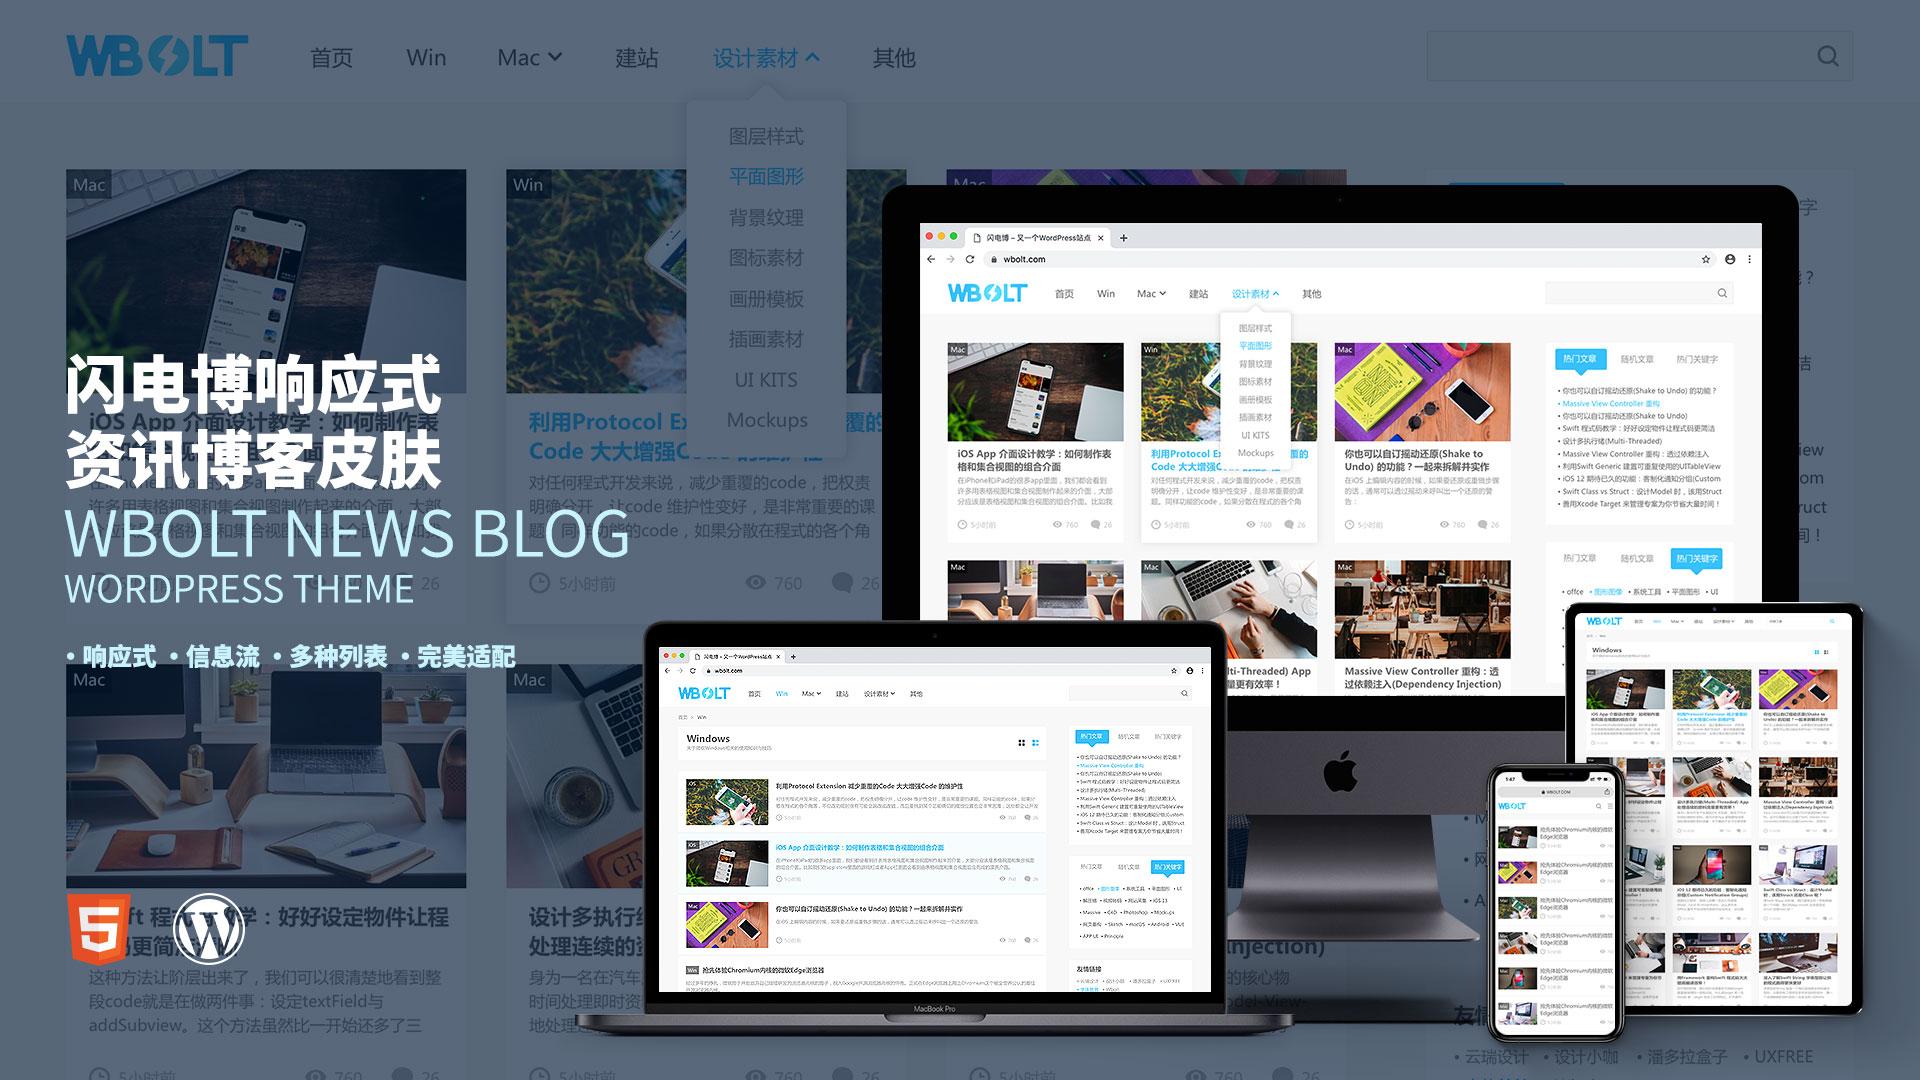 RK Blogger-免费WordPress资讯博客主题插图(1)